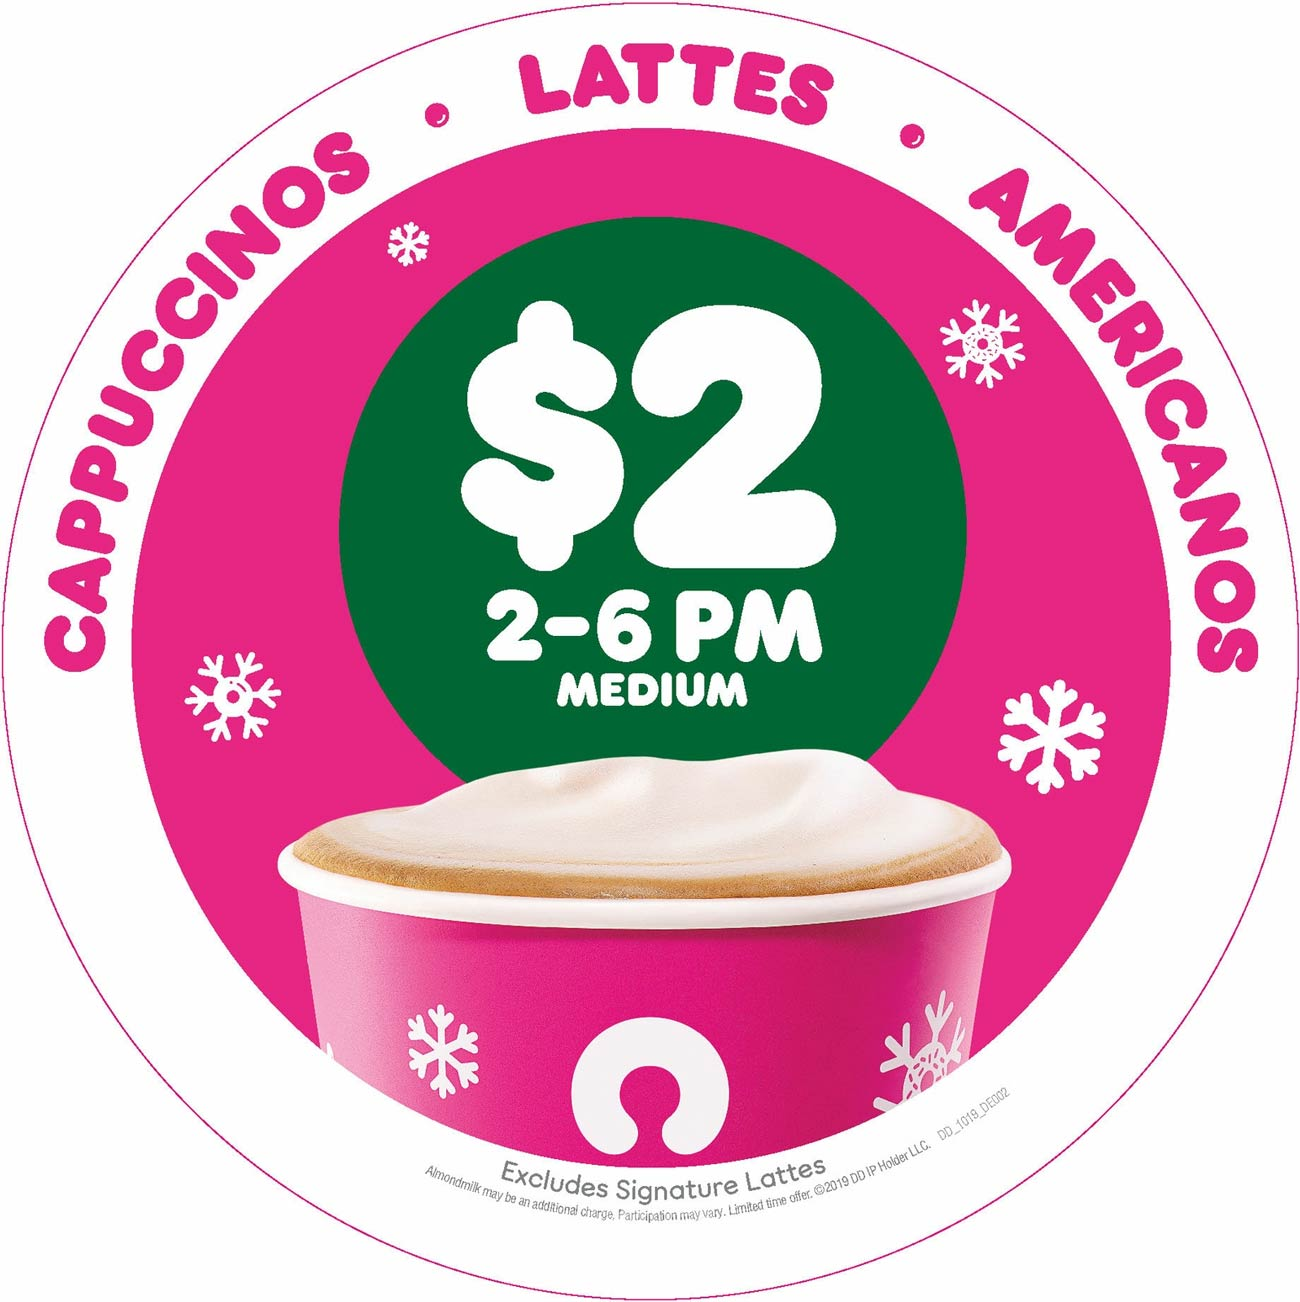 Dunkin Donuts Coupon December 2019 $2 medium cappuccinos & more 2-6p at Dunkin Donuts